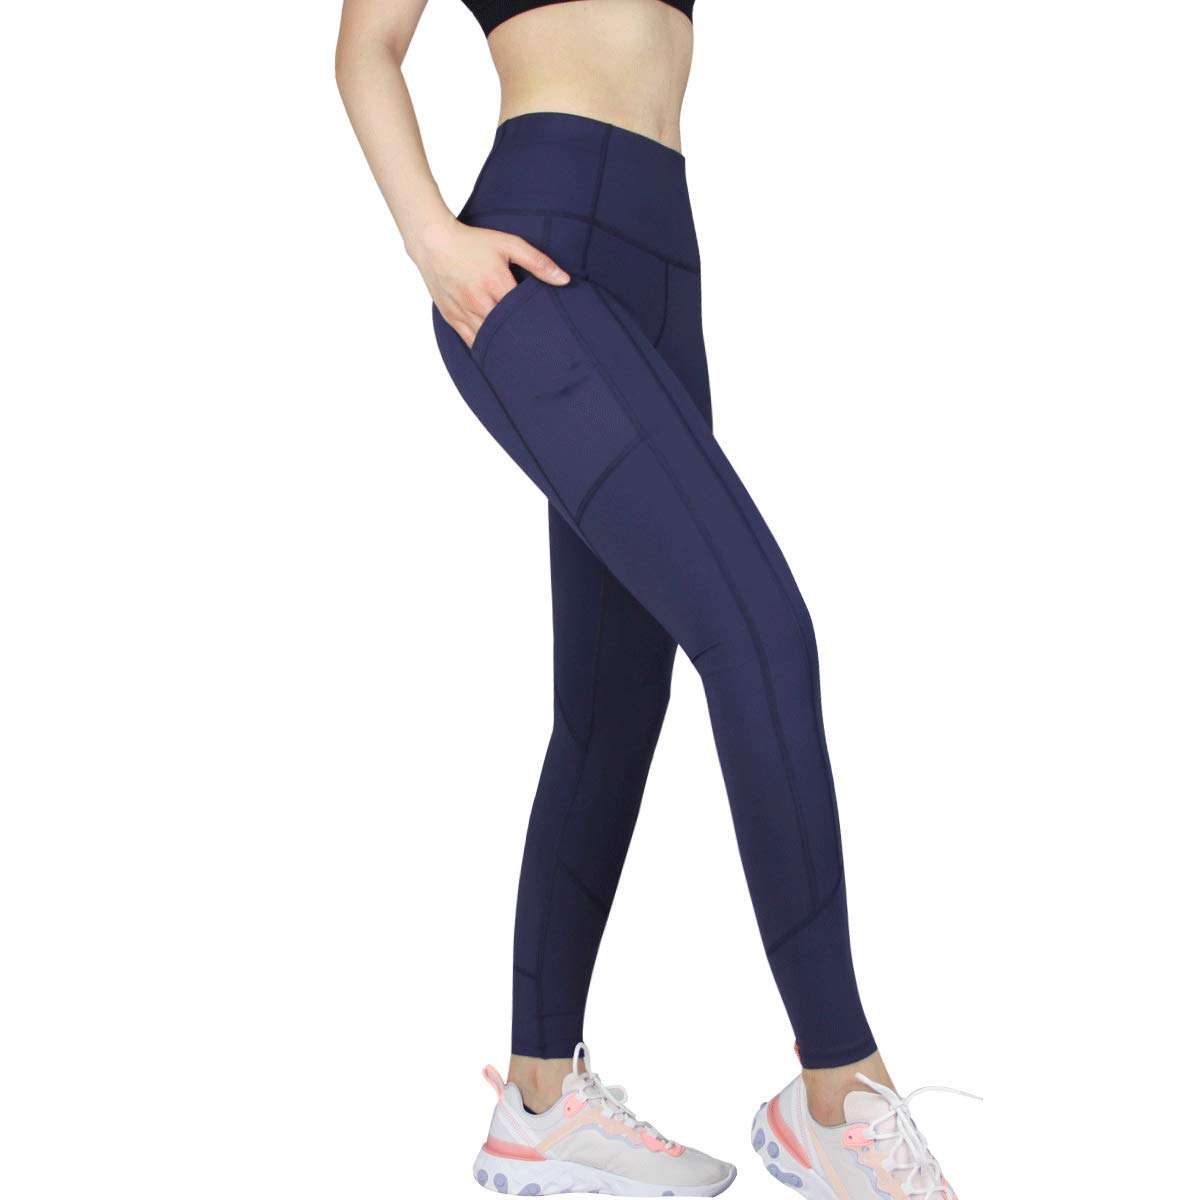 pinziko Women's Winter Running Pants High Waist Tummy Control Yoga Leggings Training Sports Pants with Pockets